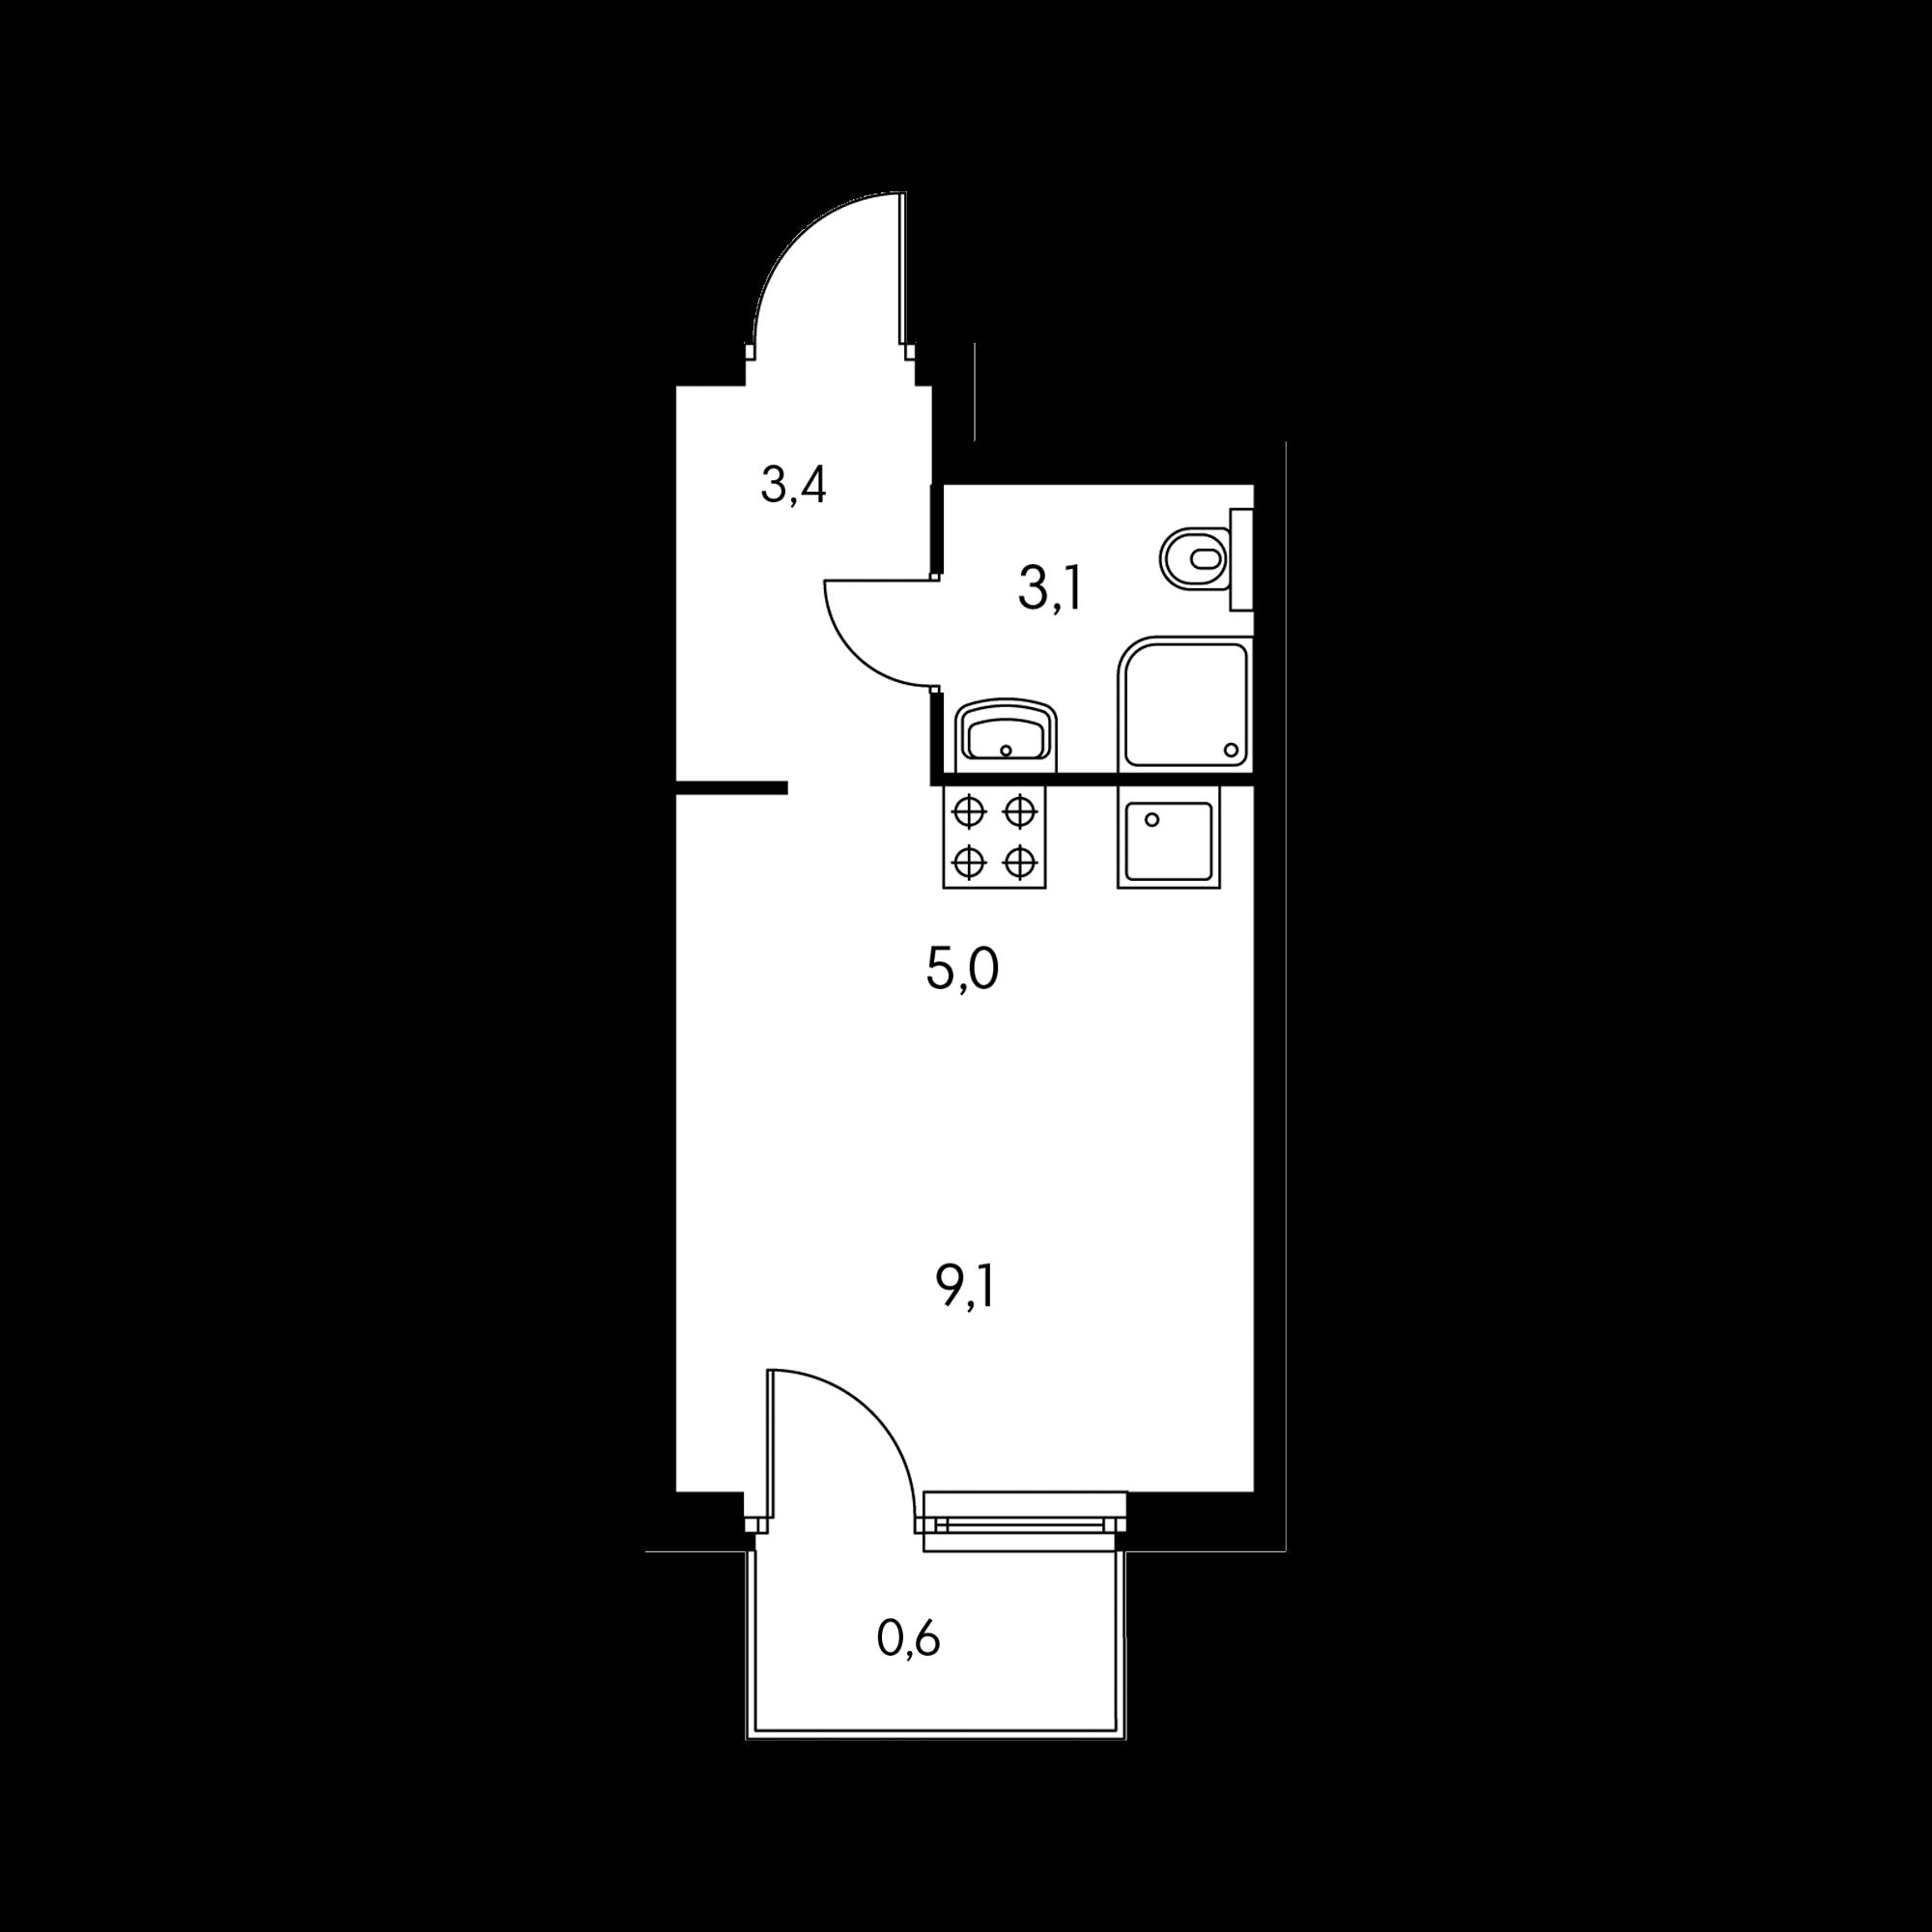 1NS1-B1